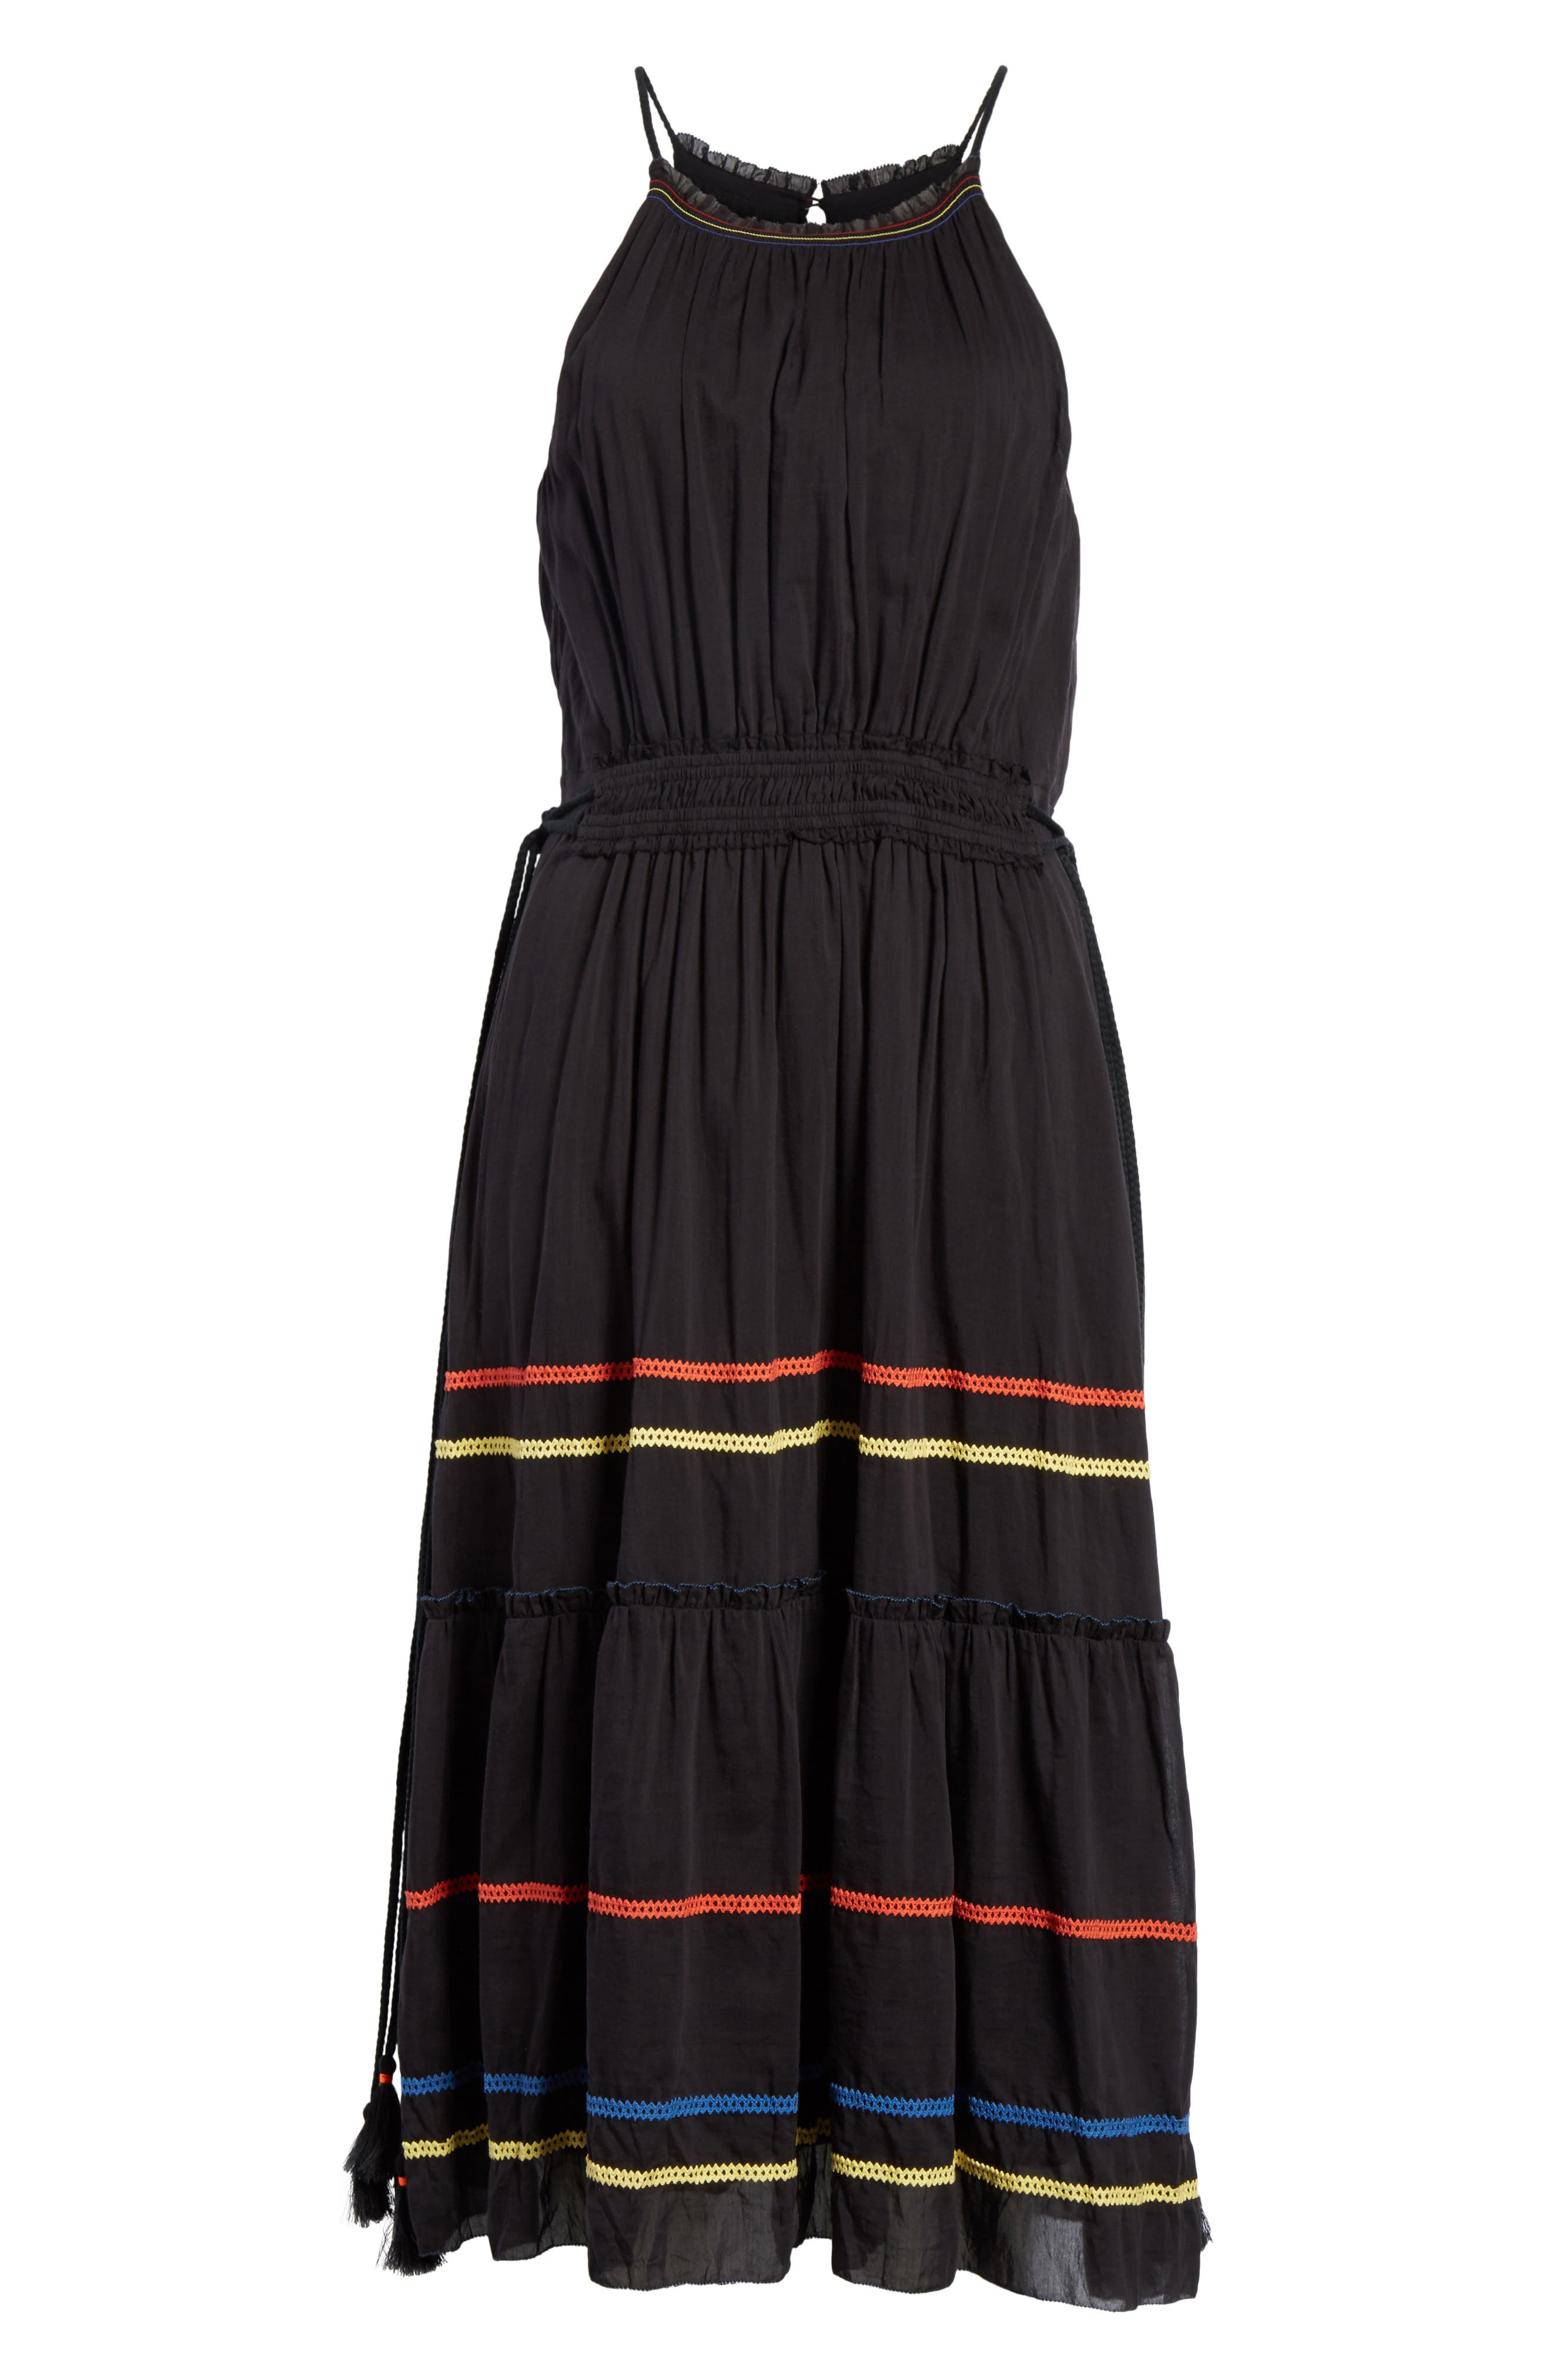 Danit Embroidered Stripe Cotton & Silk Dress,                             Alternate thumbnail 6, color,                             001